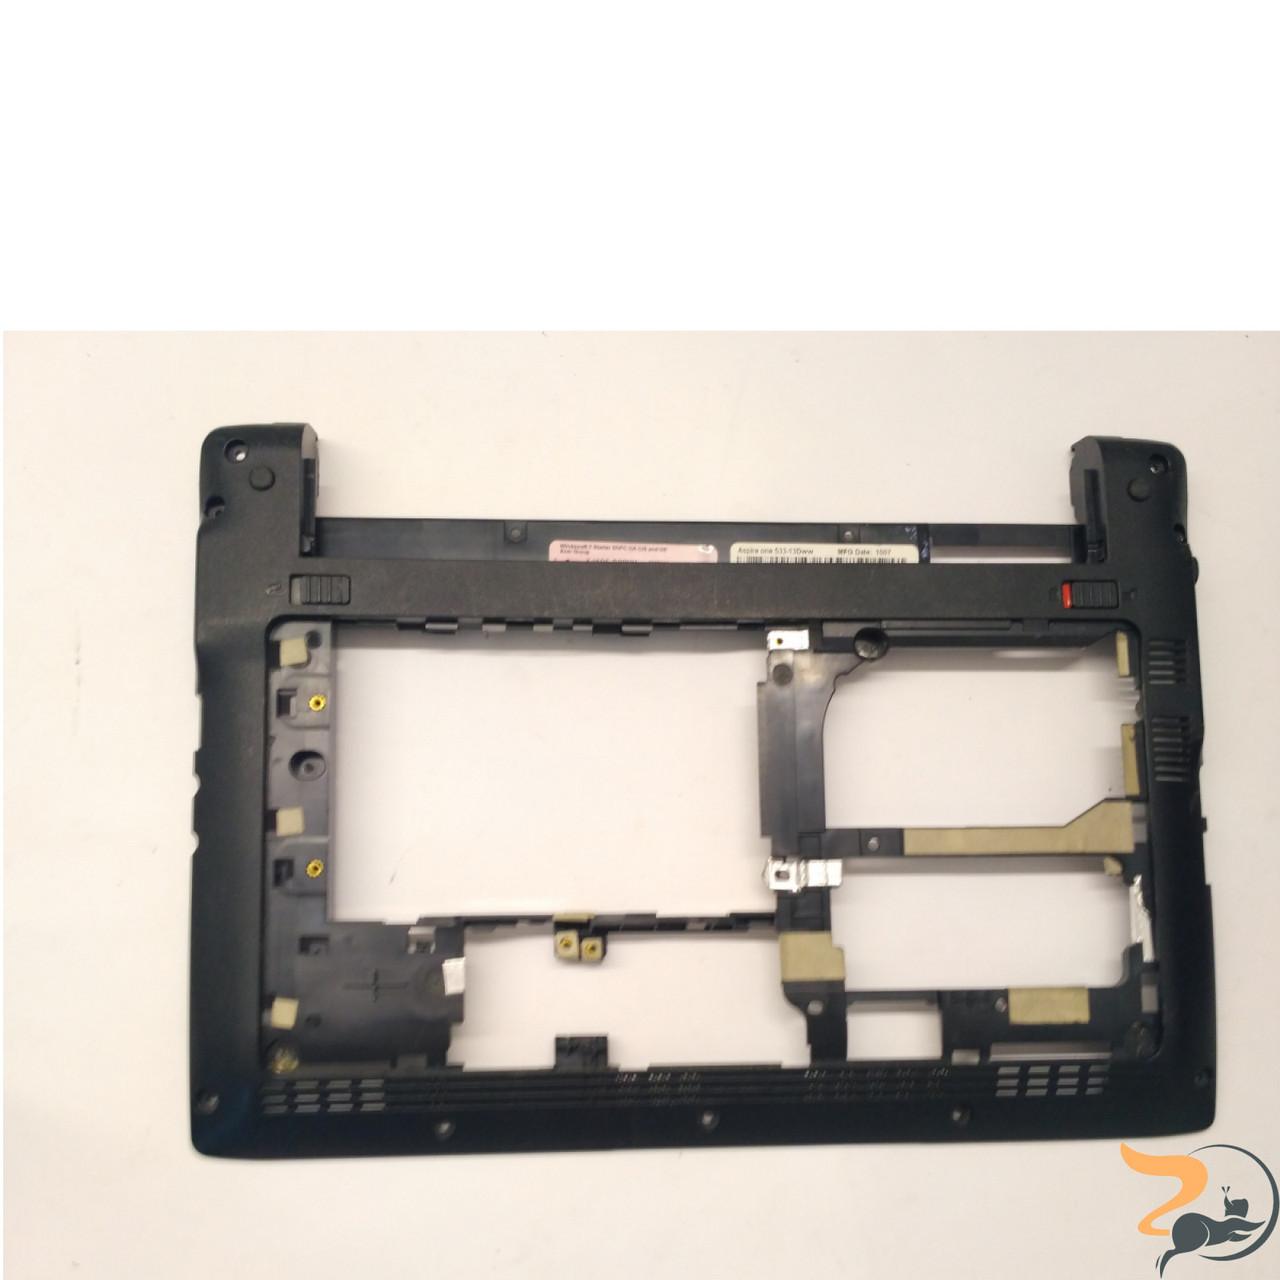 "Нижня частина корпуса для ноутбука Acer Ferrari F200, 10.1"", AP0EB000110, Б/В"